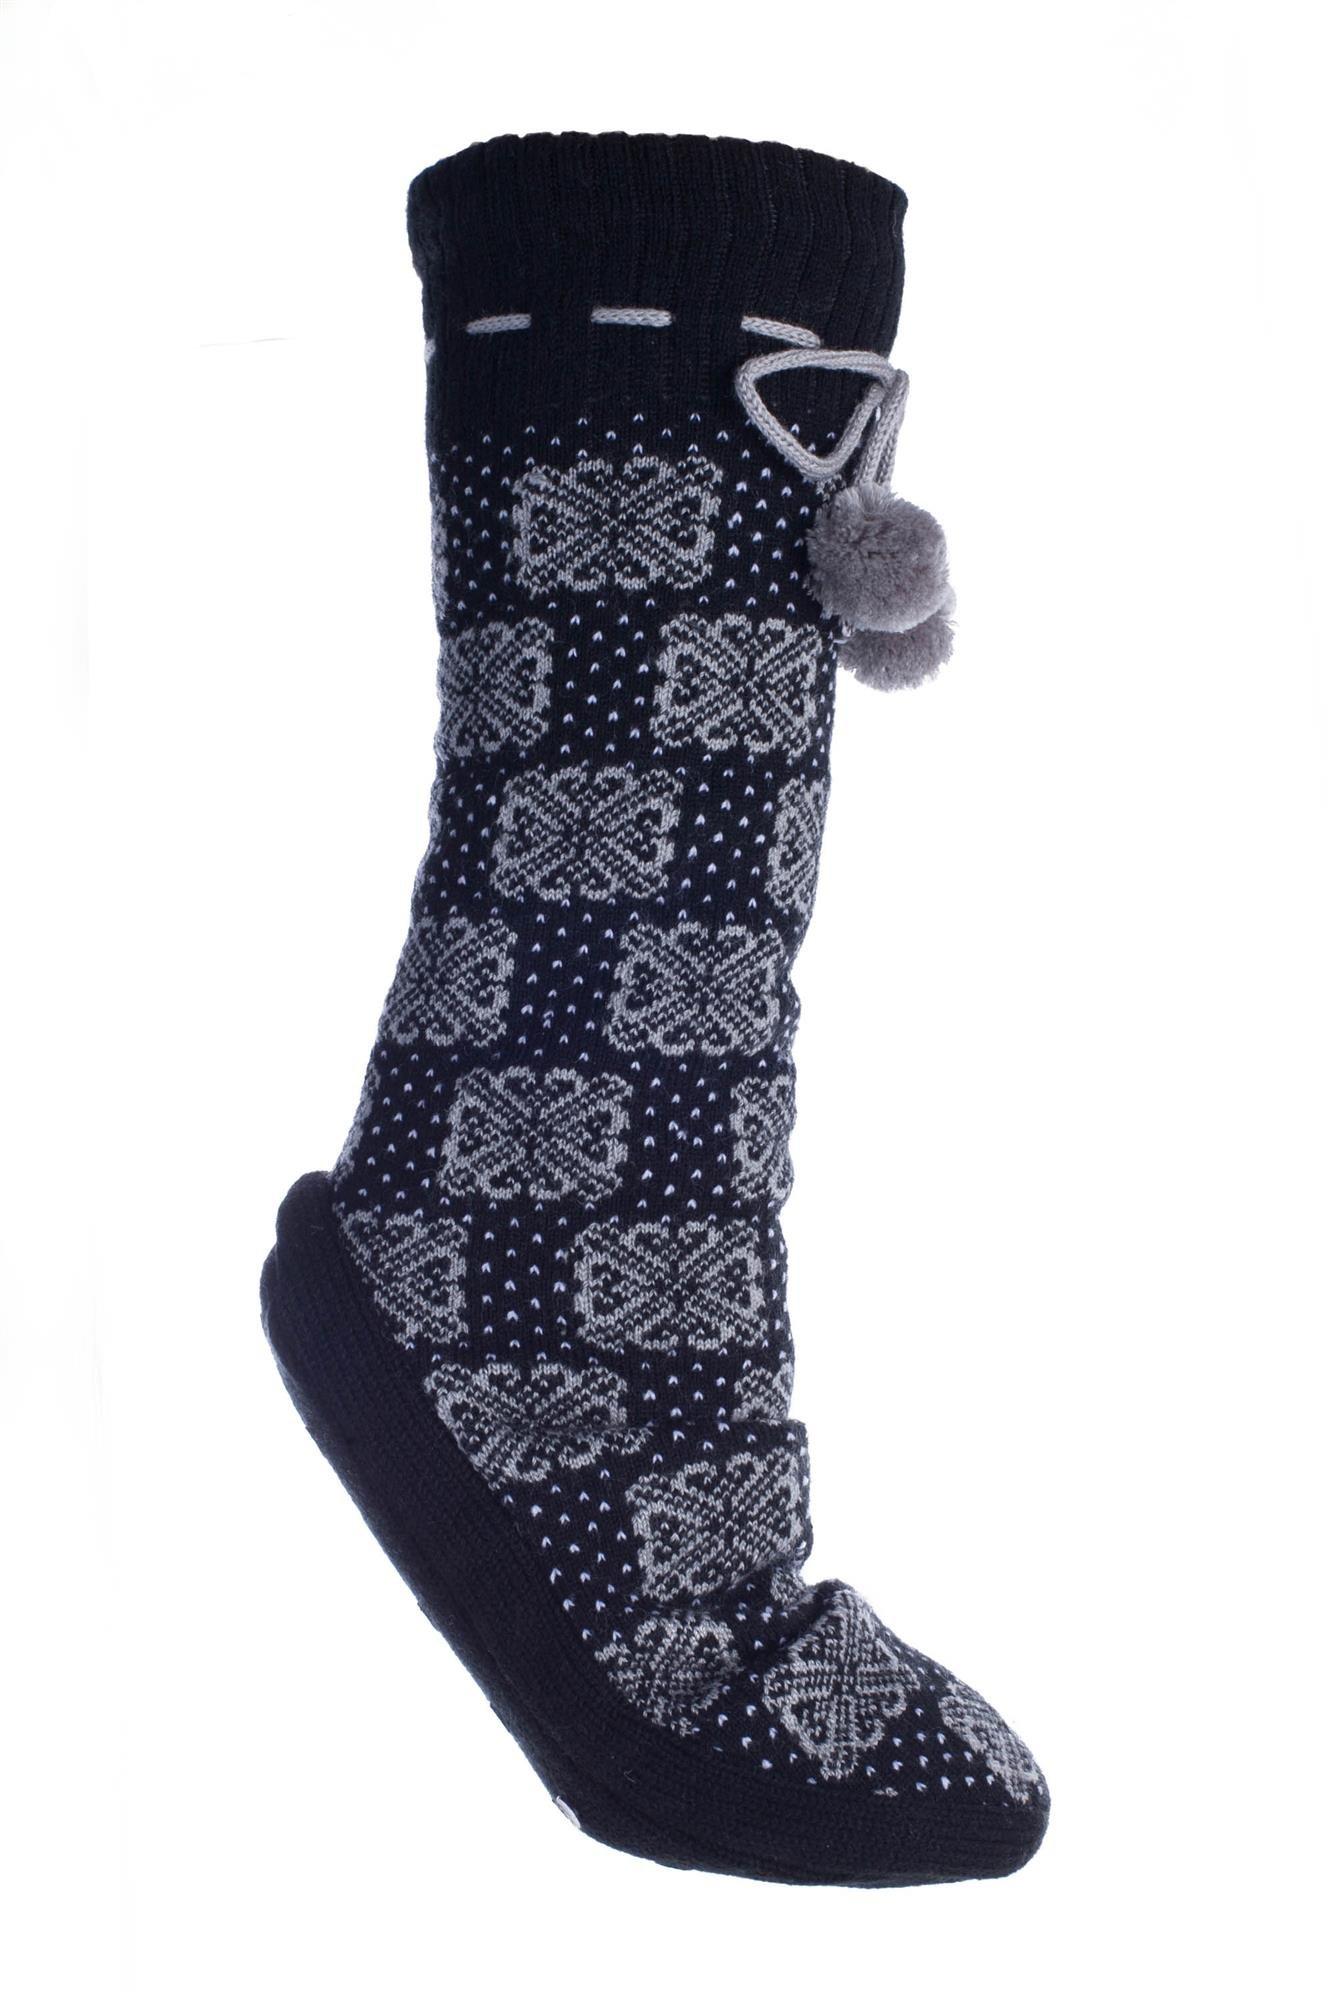 Women's Non-Slip Fuzzy Slipper Socks With Pom Poms Tile Large By MinxNY by MinxNY